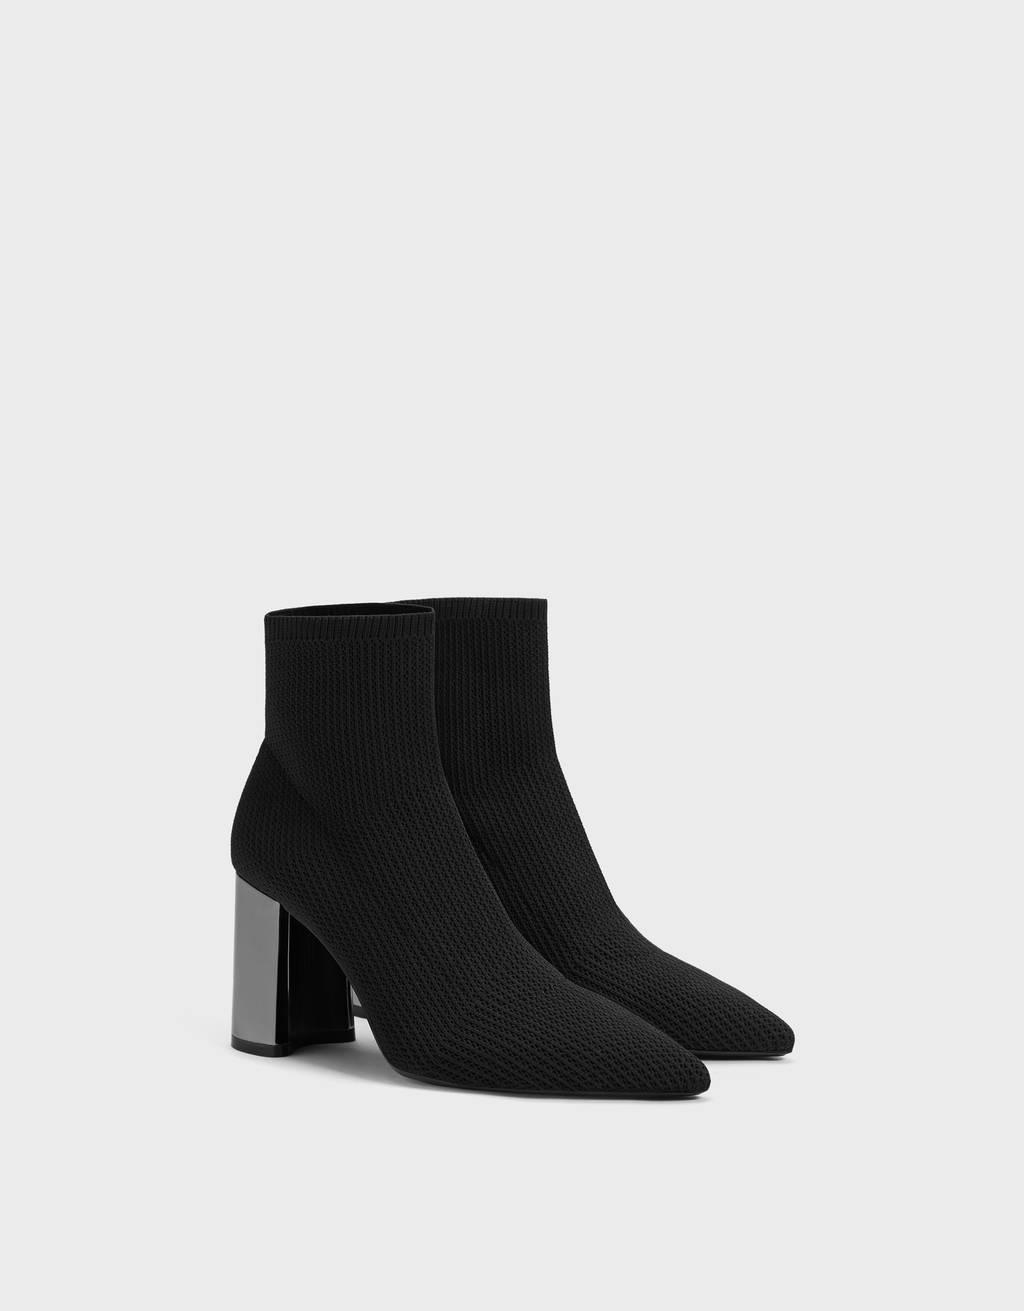 9a6457c9d Zapatos de mujer - Otoño 2019 | Bershka